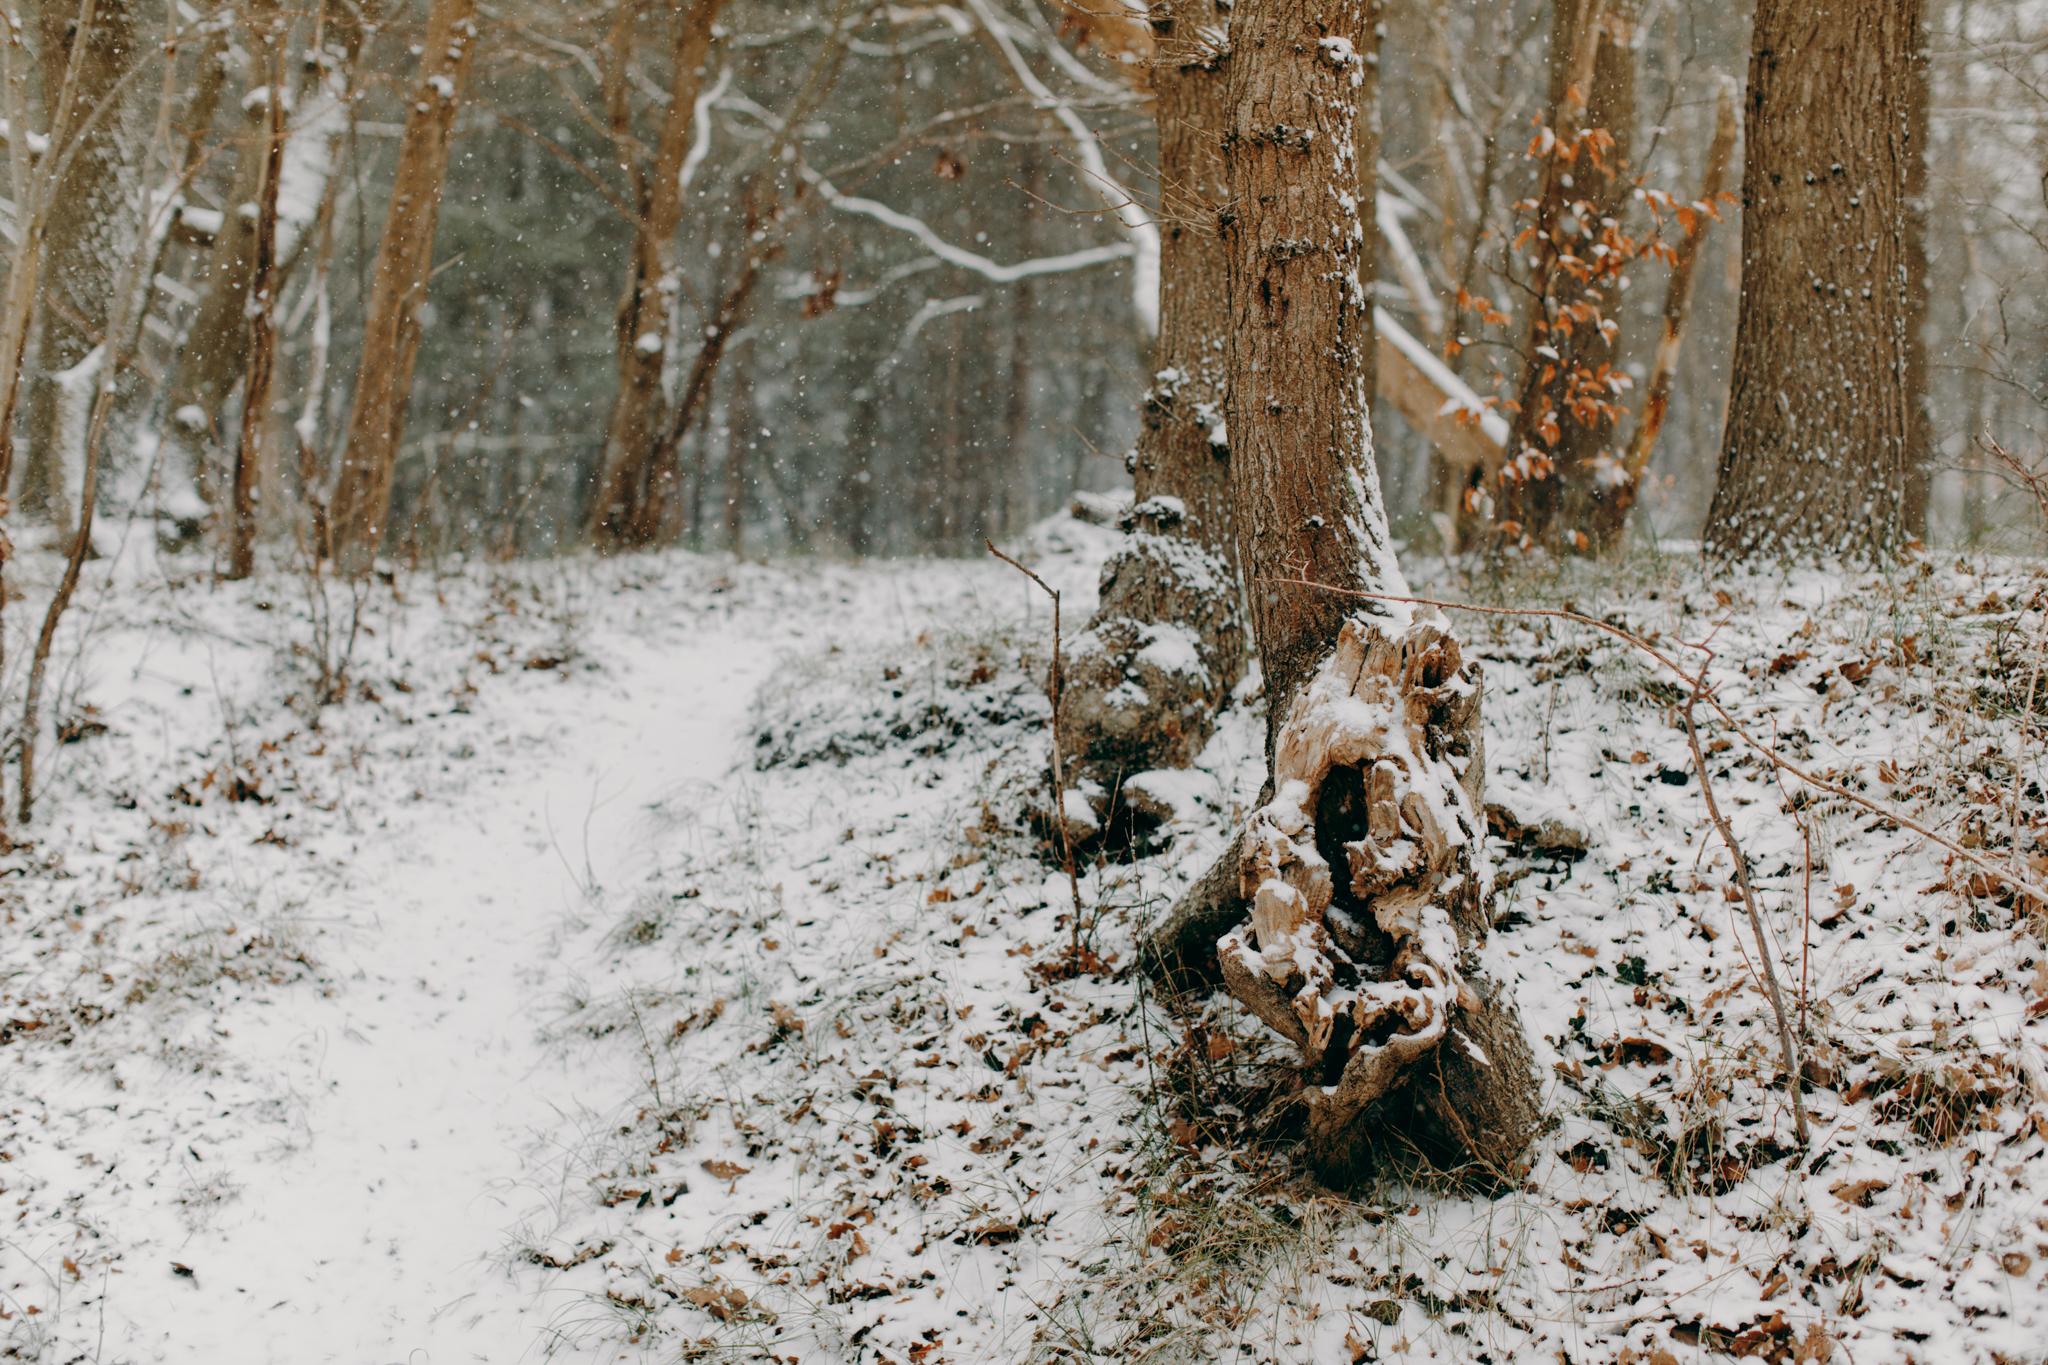 008-winter-sneeuw-oosterplas-bloemendaal.jpg